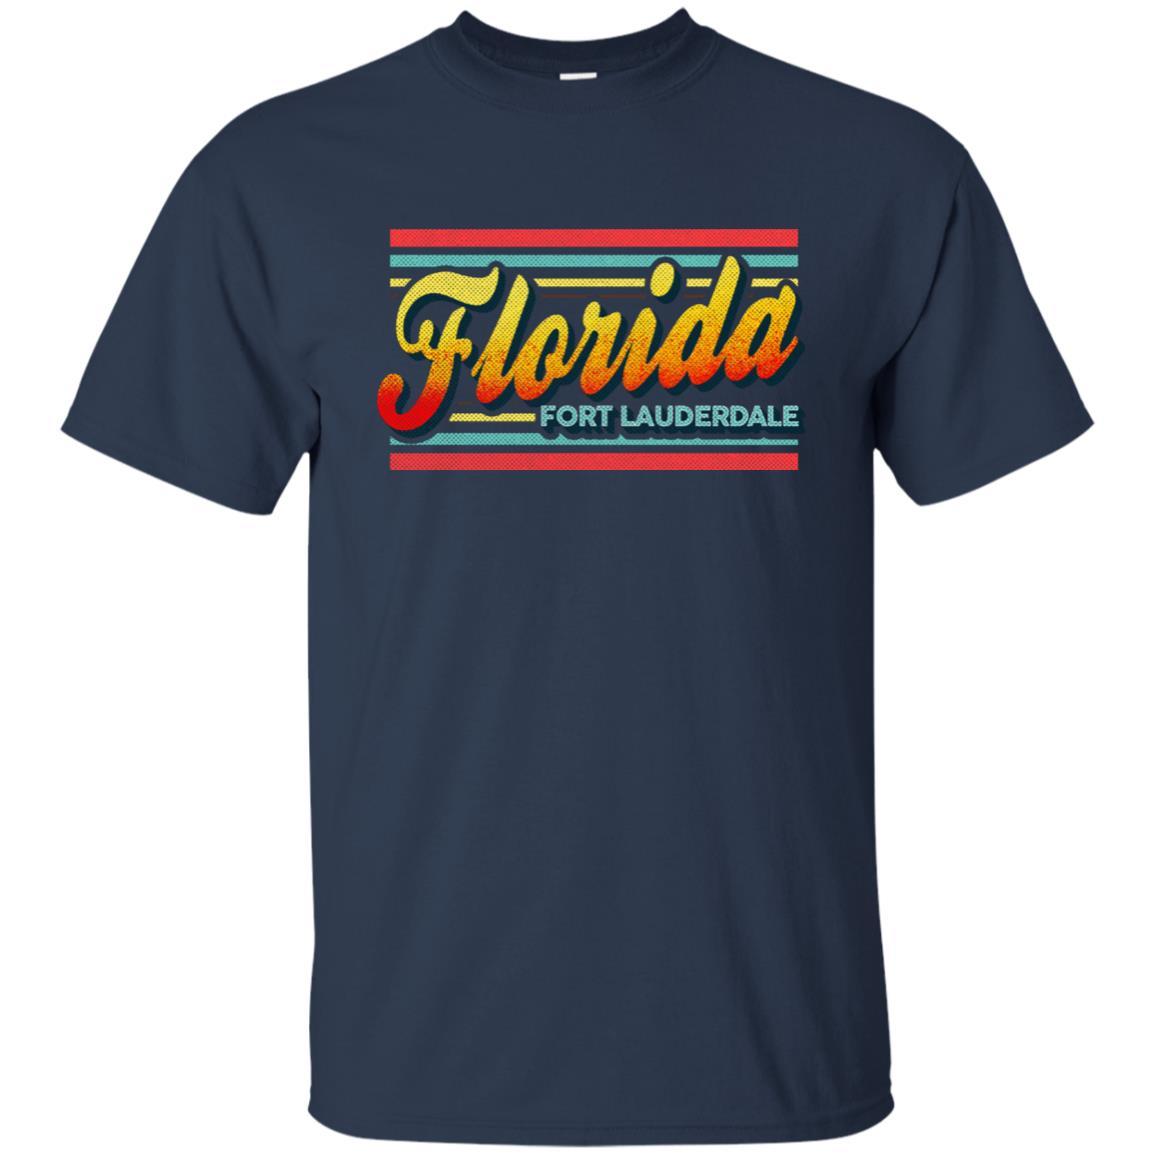 Fort Lauderdale Florida Retro Vintage 80s Unisex Short Sleeve